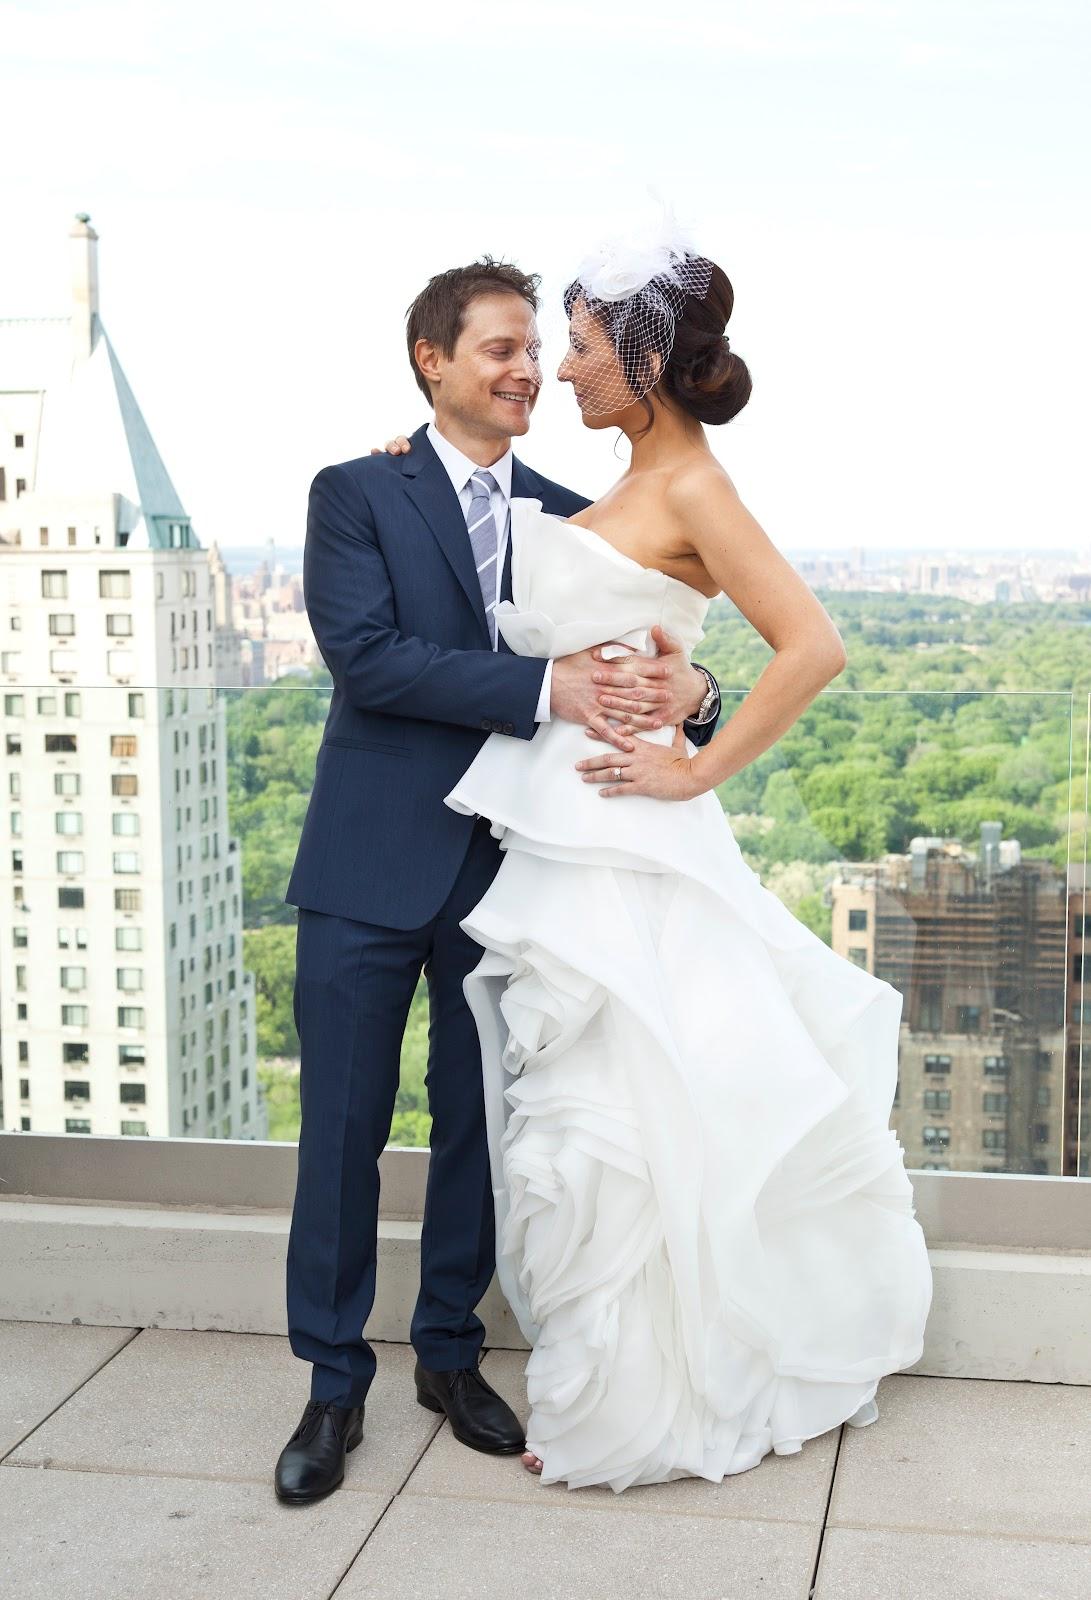 NYC: WEDDING HAIR: JESSICA & OREN - ANH CO TRAN : CELEBRITY HAIR STYLIST